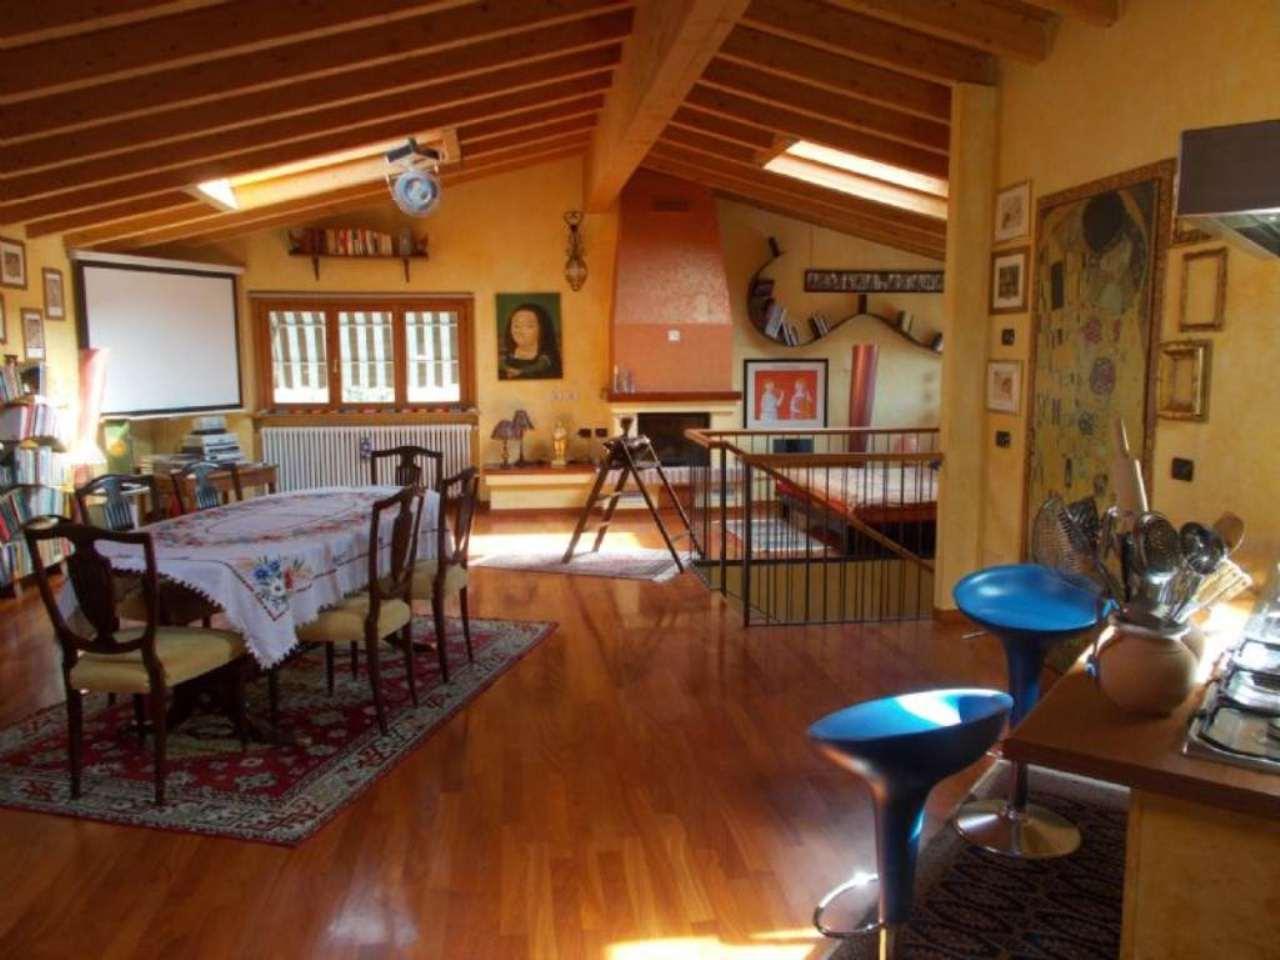 Immobili residenziali in vendita a castelleone for Luddui case vendita